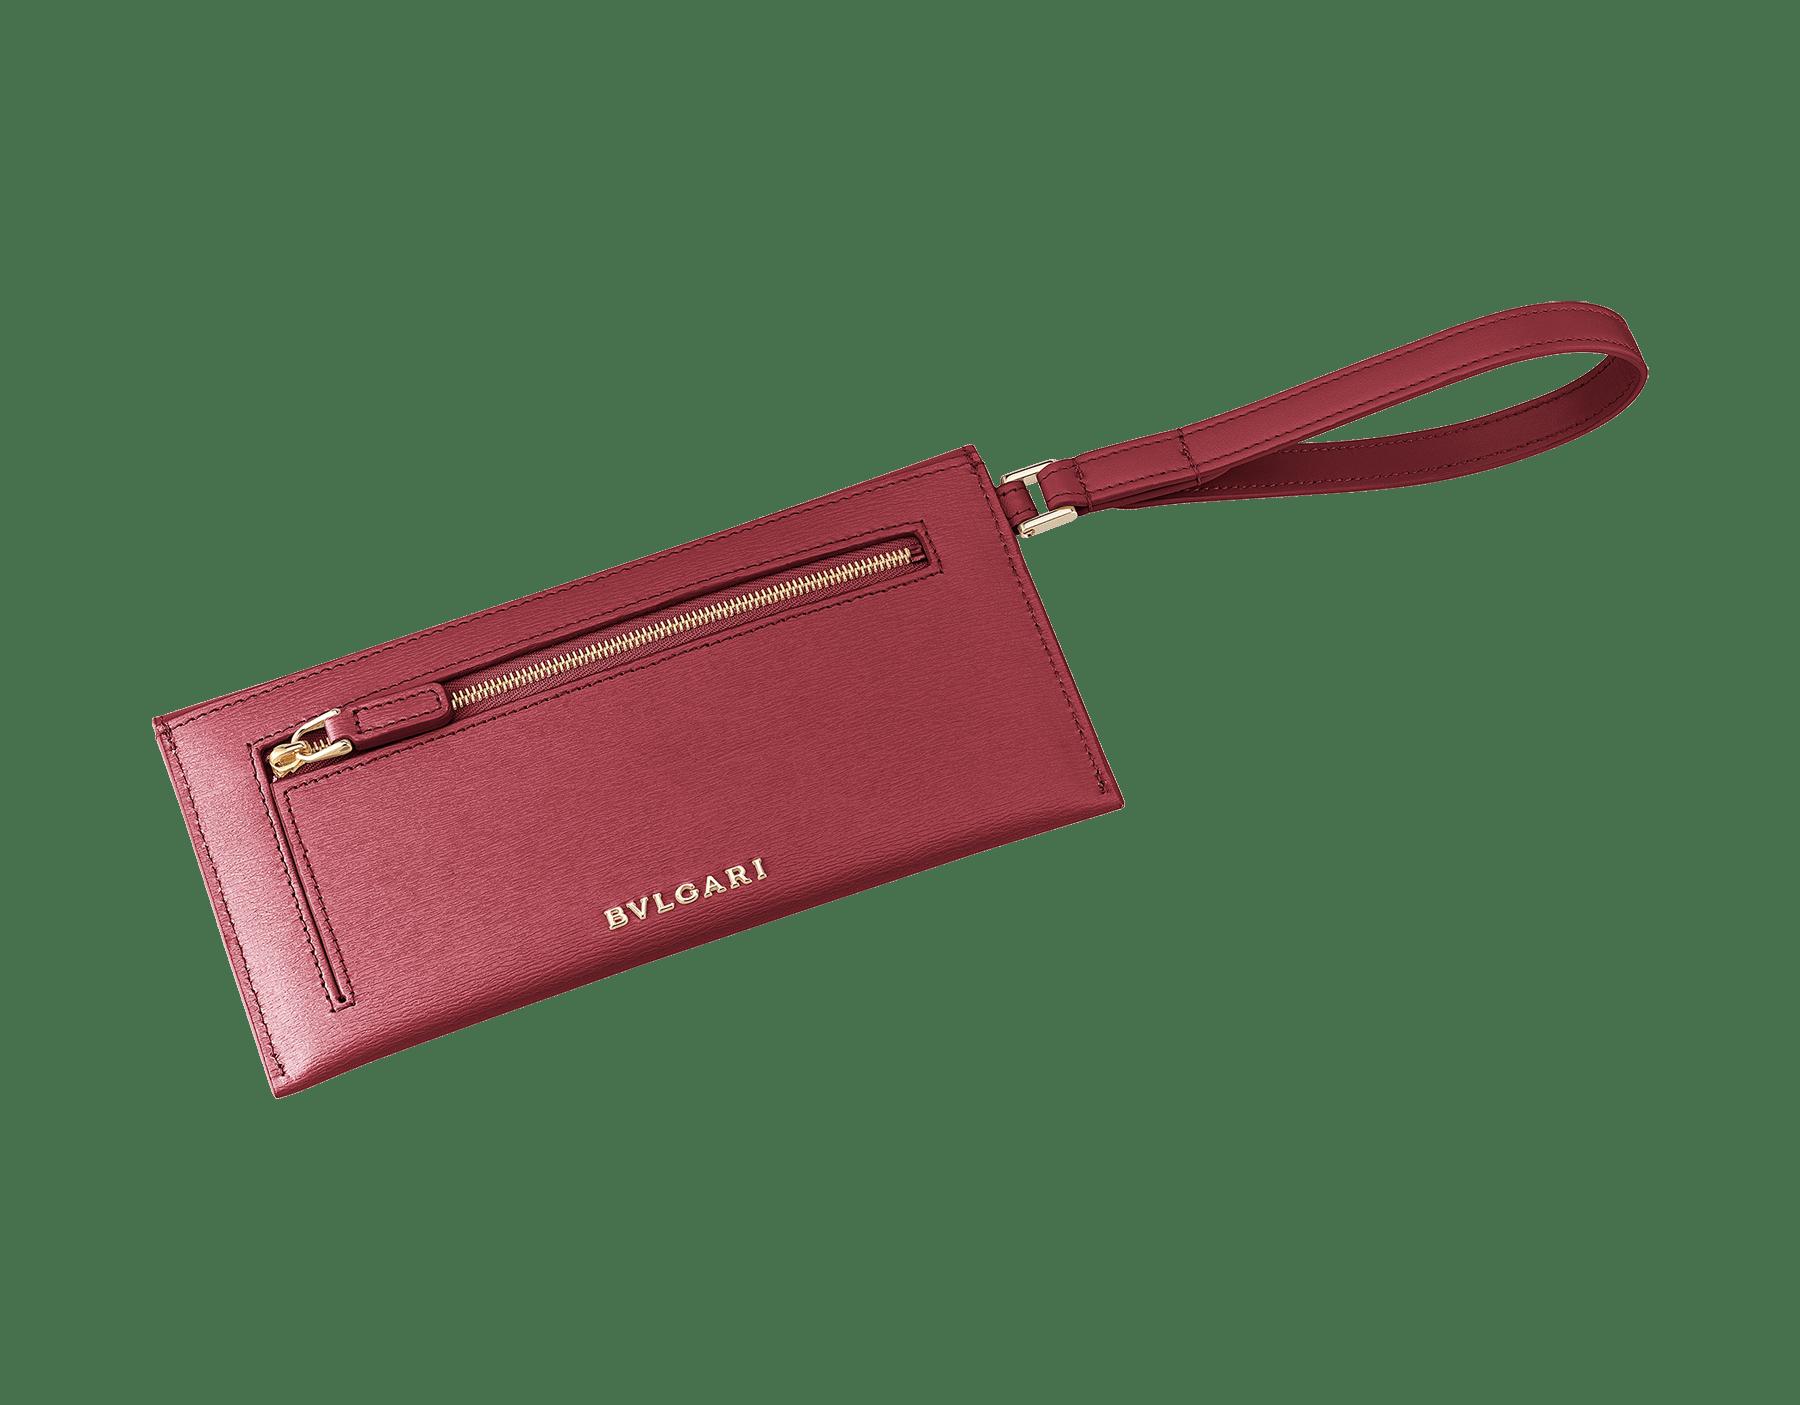 Serpenti Forever envelope case in Roman garnet calf leather and Roman garnet goatskin. Iconic snakehead charm in black and Roman garnet enamel, with black onyx eyes. 289089 image 3